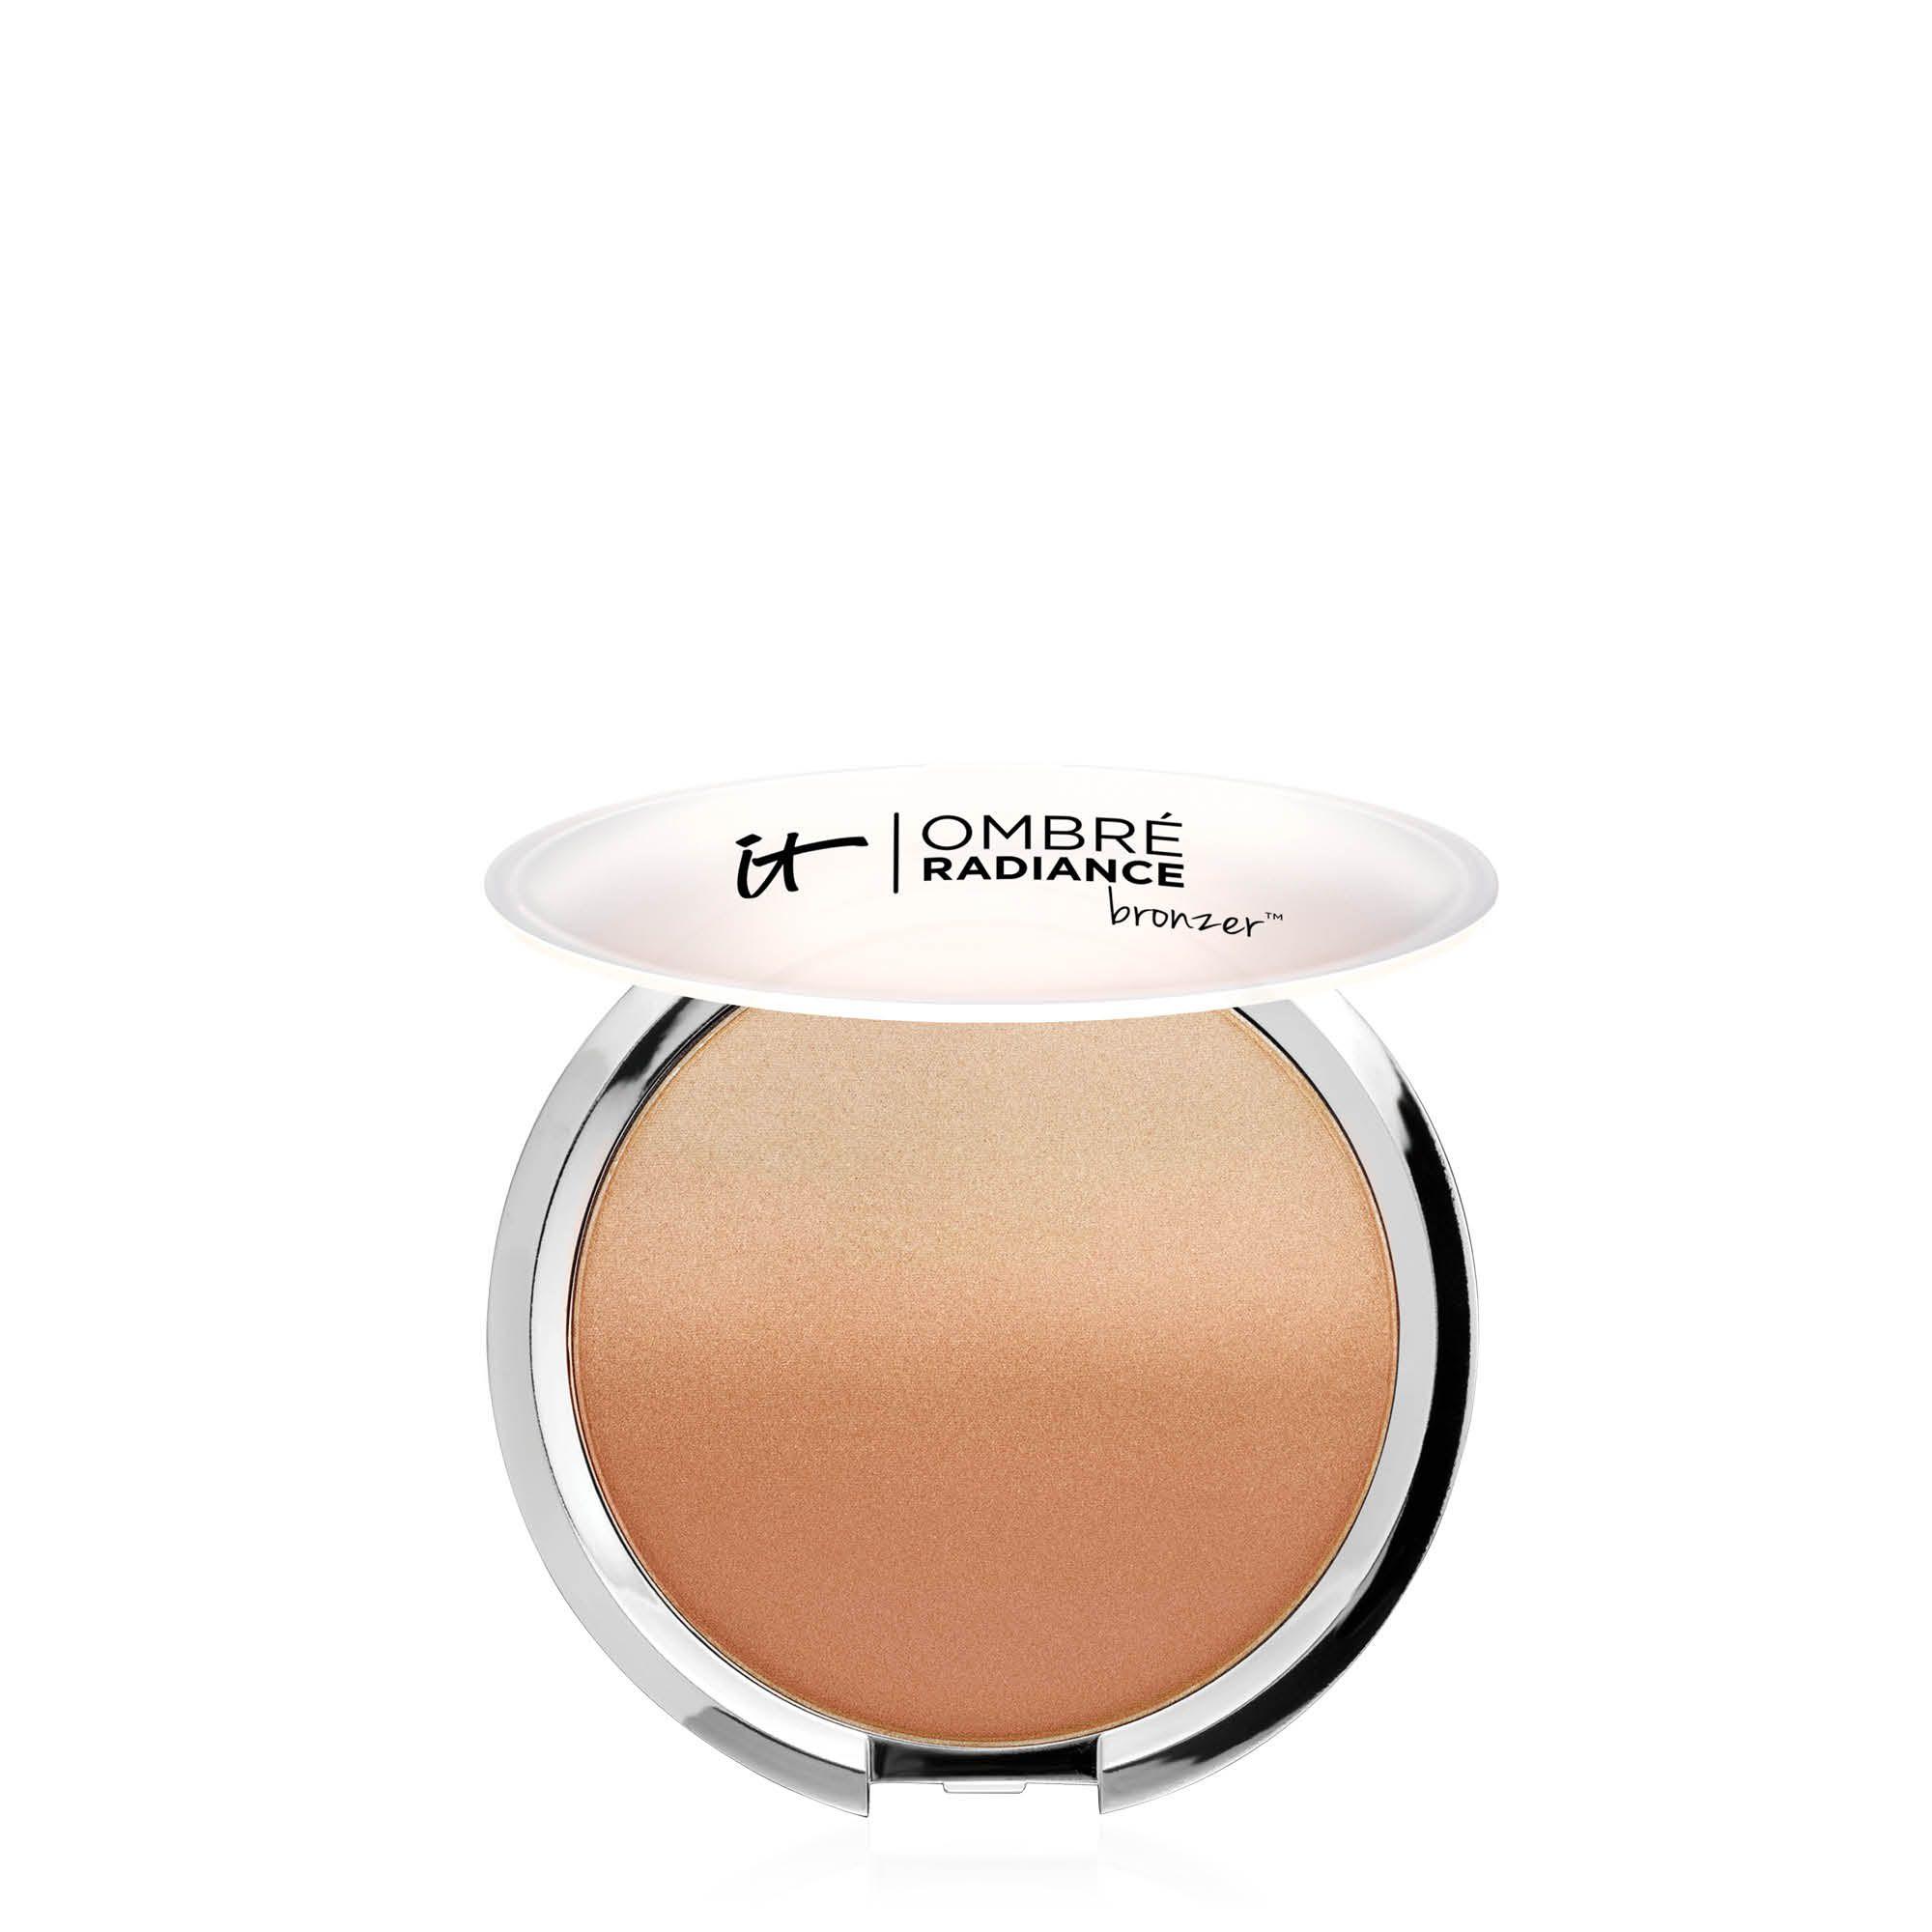 It Cosmetics Ombre Radiance Bronzer